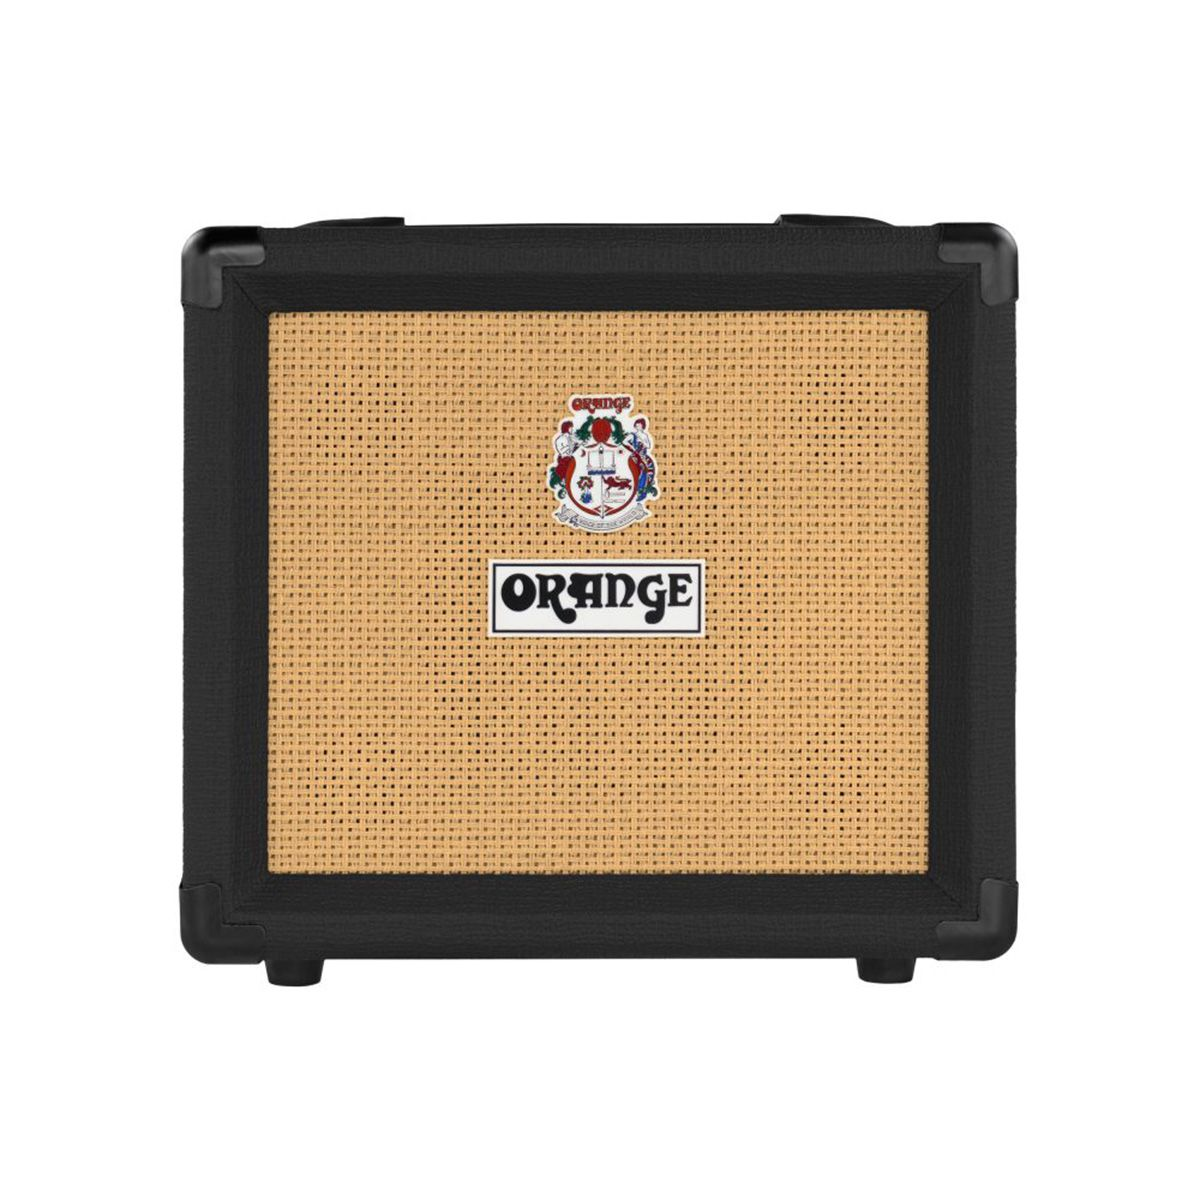 Caixa Amplificada Orange Crush 12W 1x6 Black para Guitarra